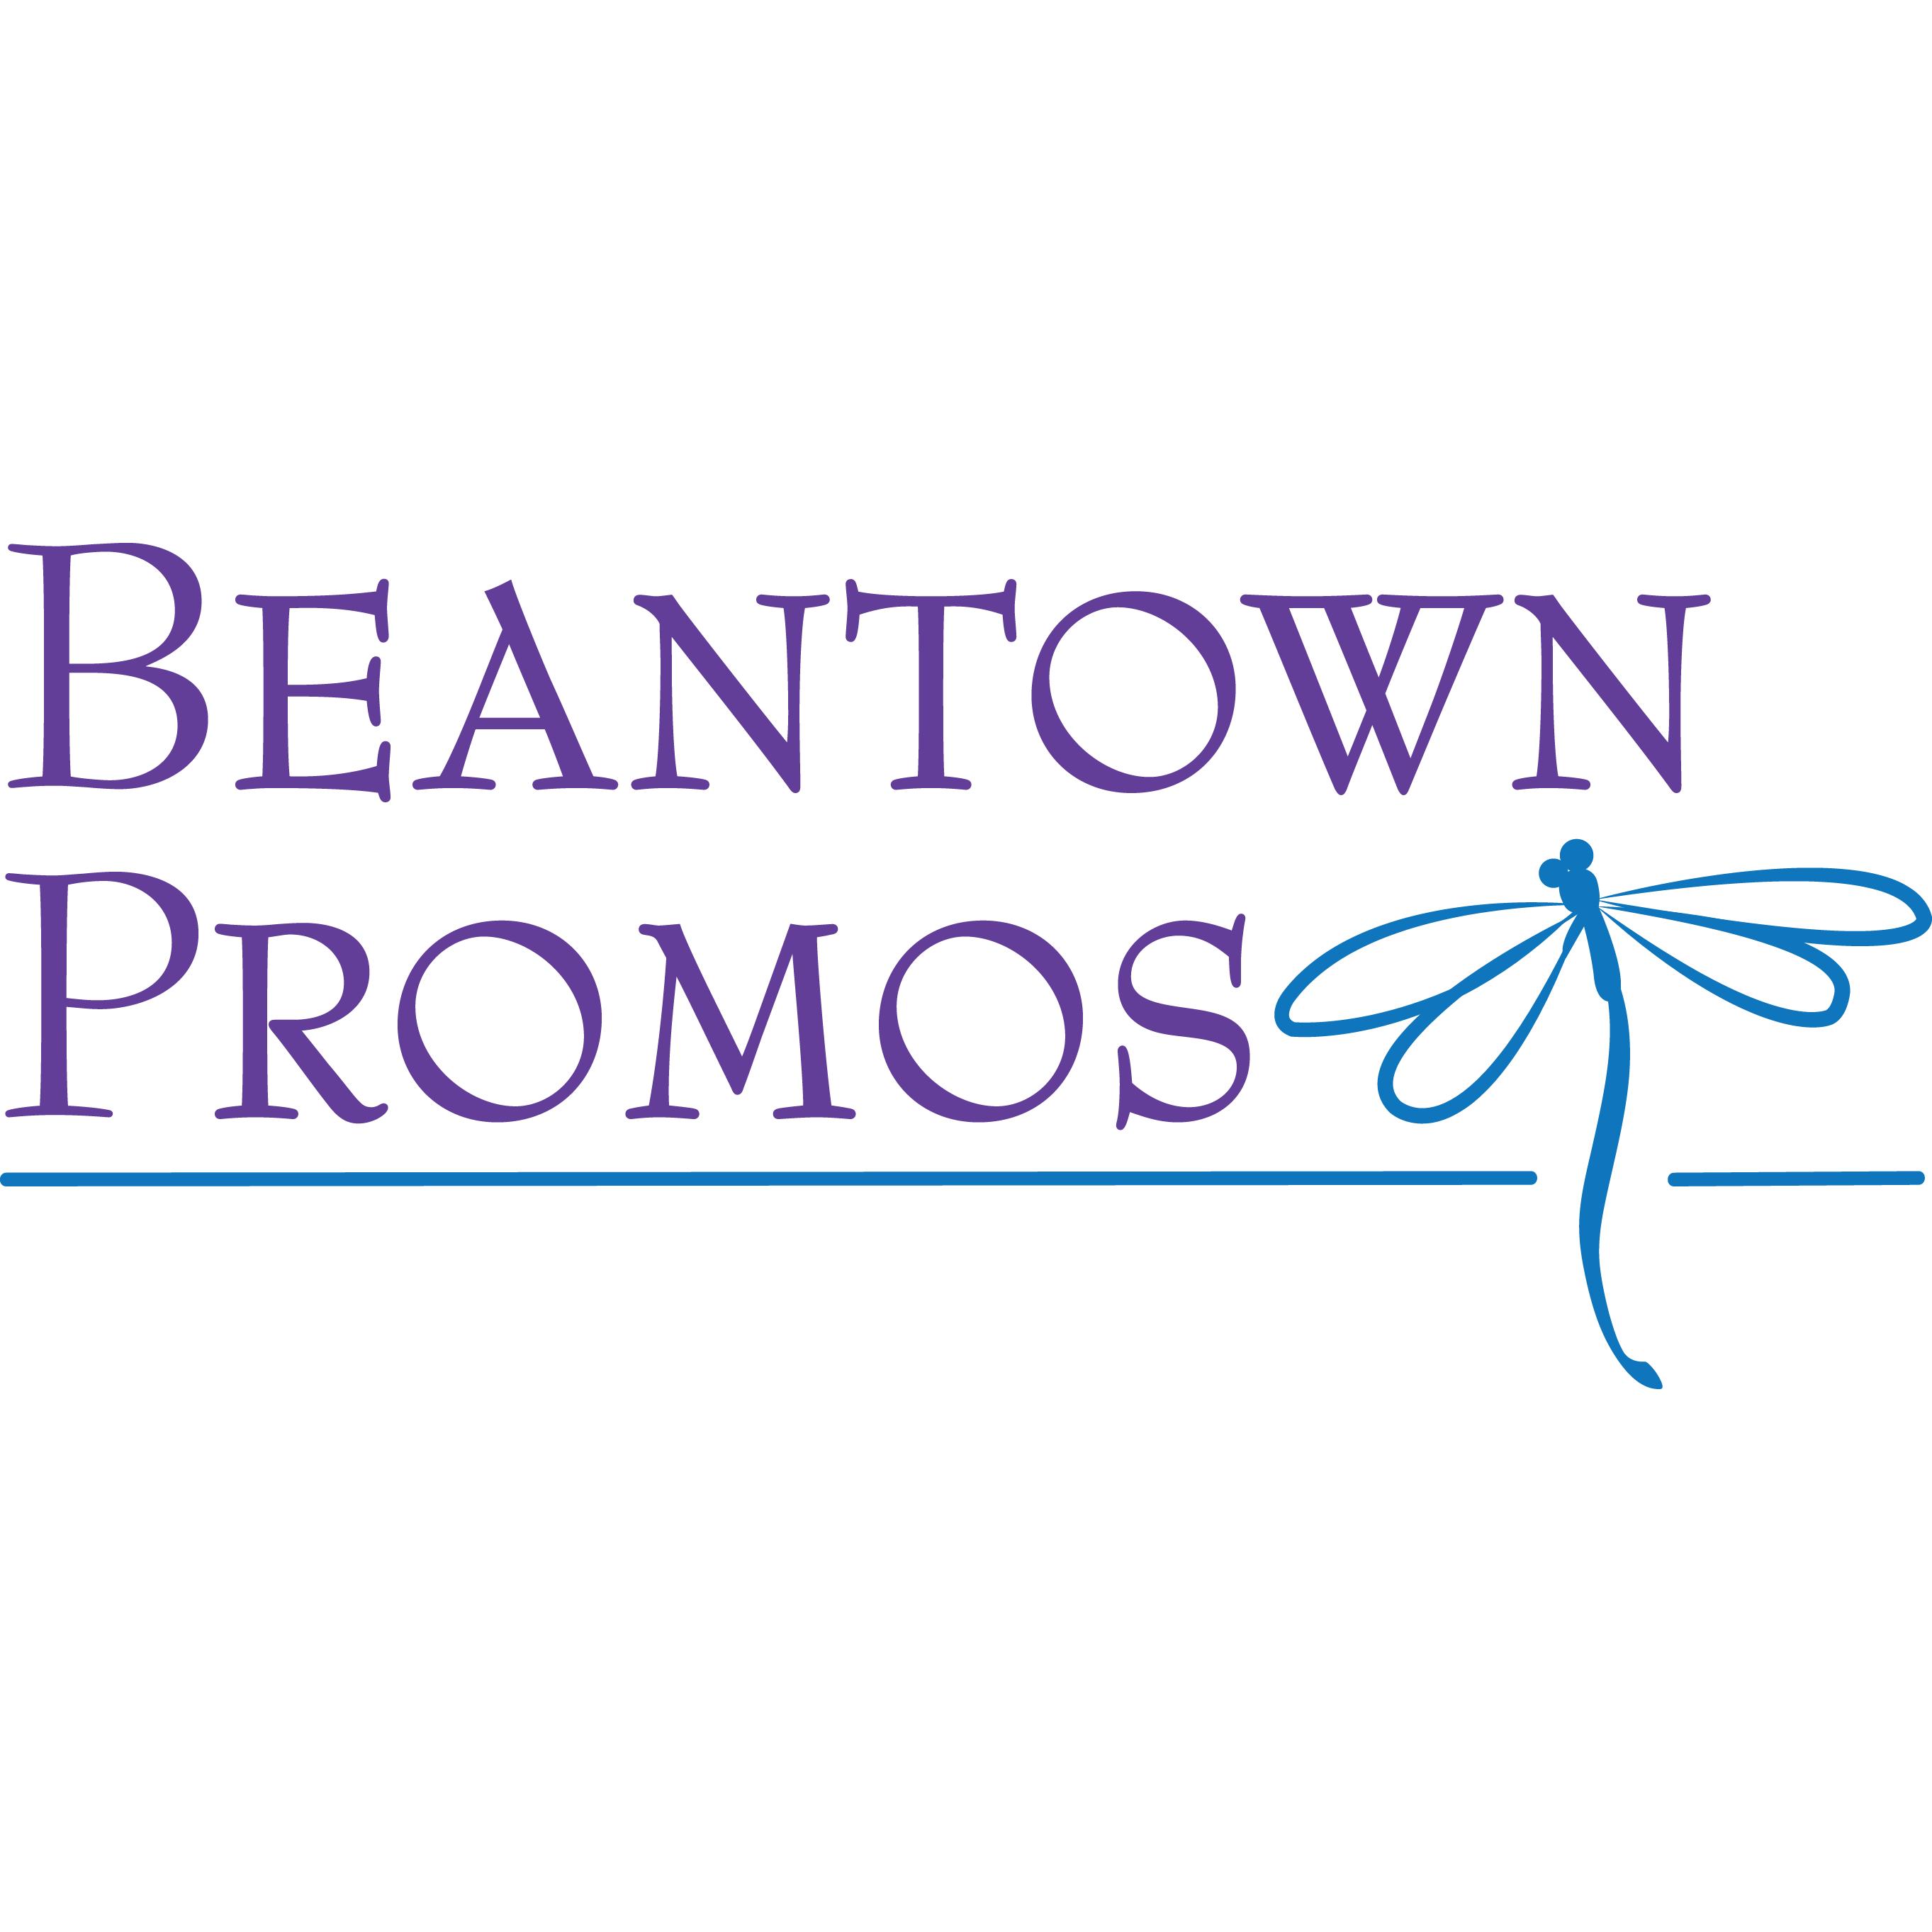 Beantown Promos Inc image 5